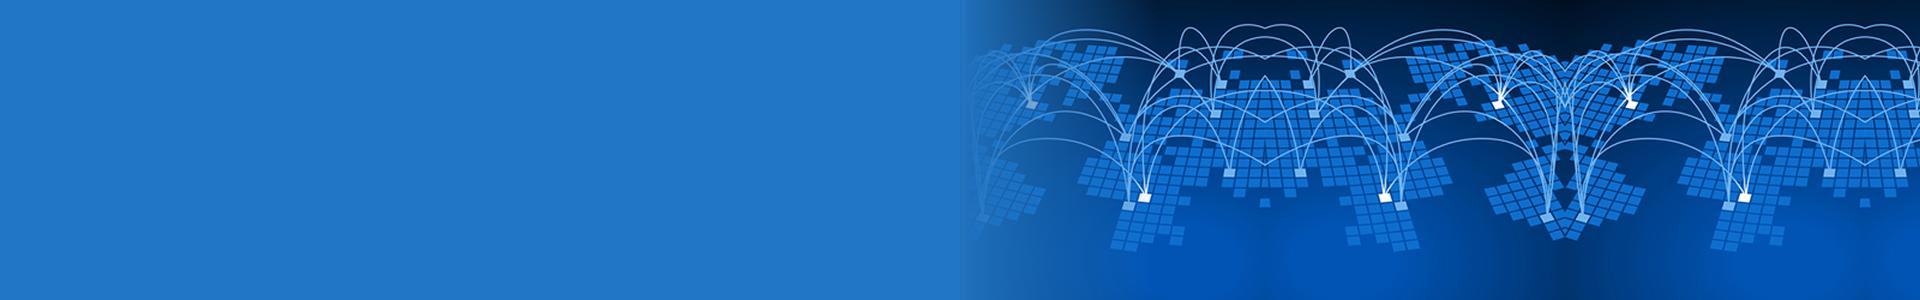 Equipo de Comunicación de Red Externa - WAN & Seguridad